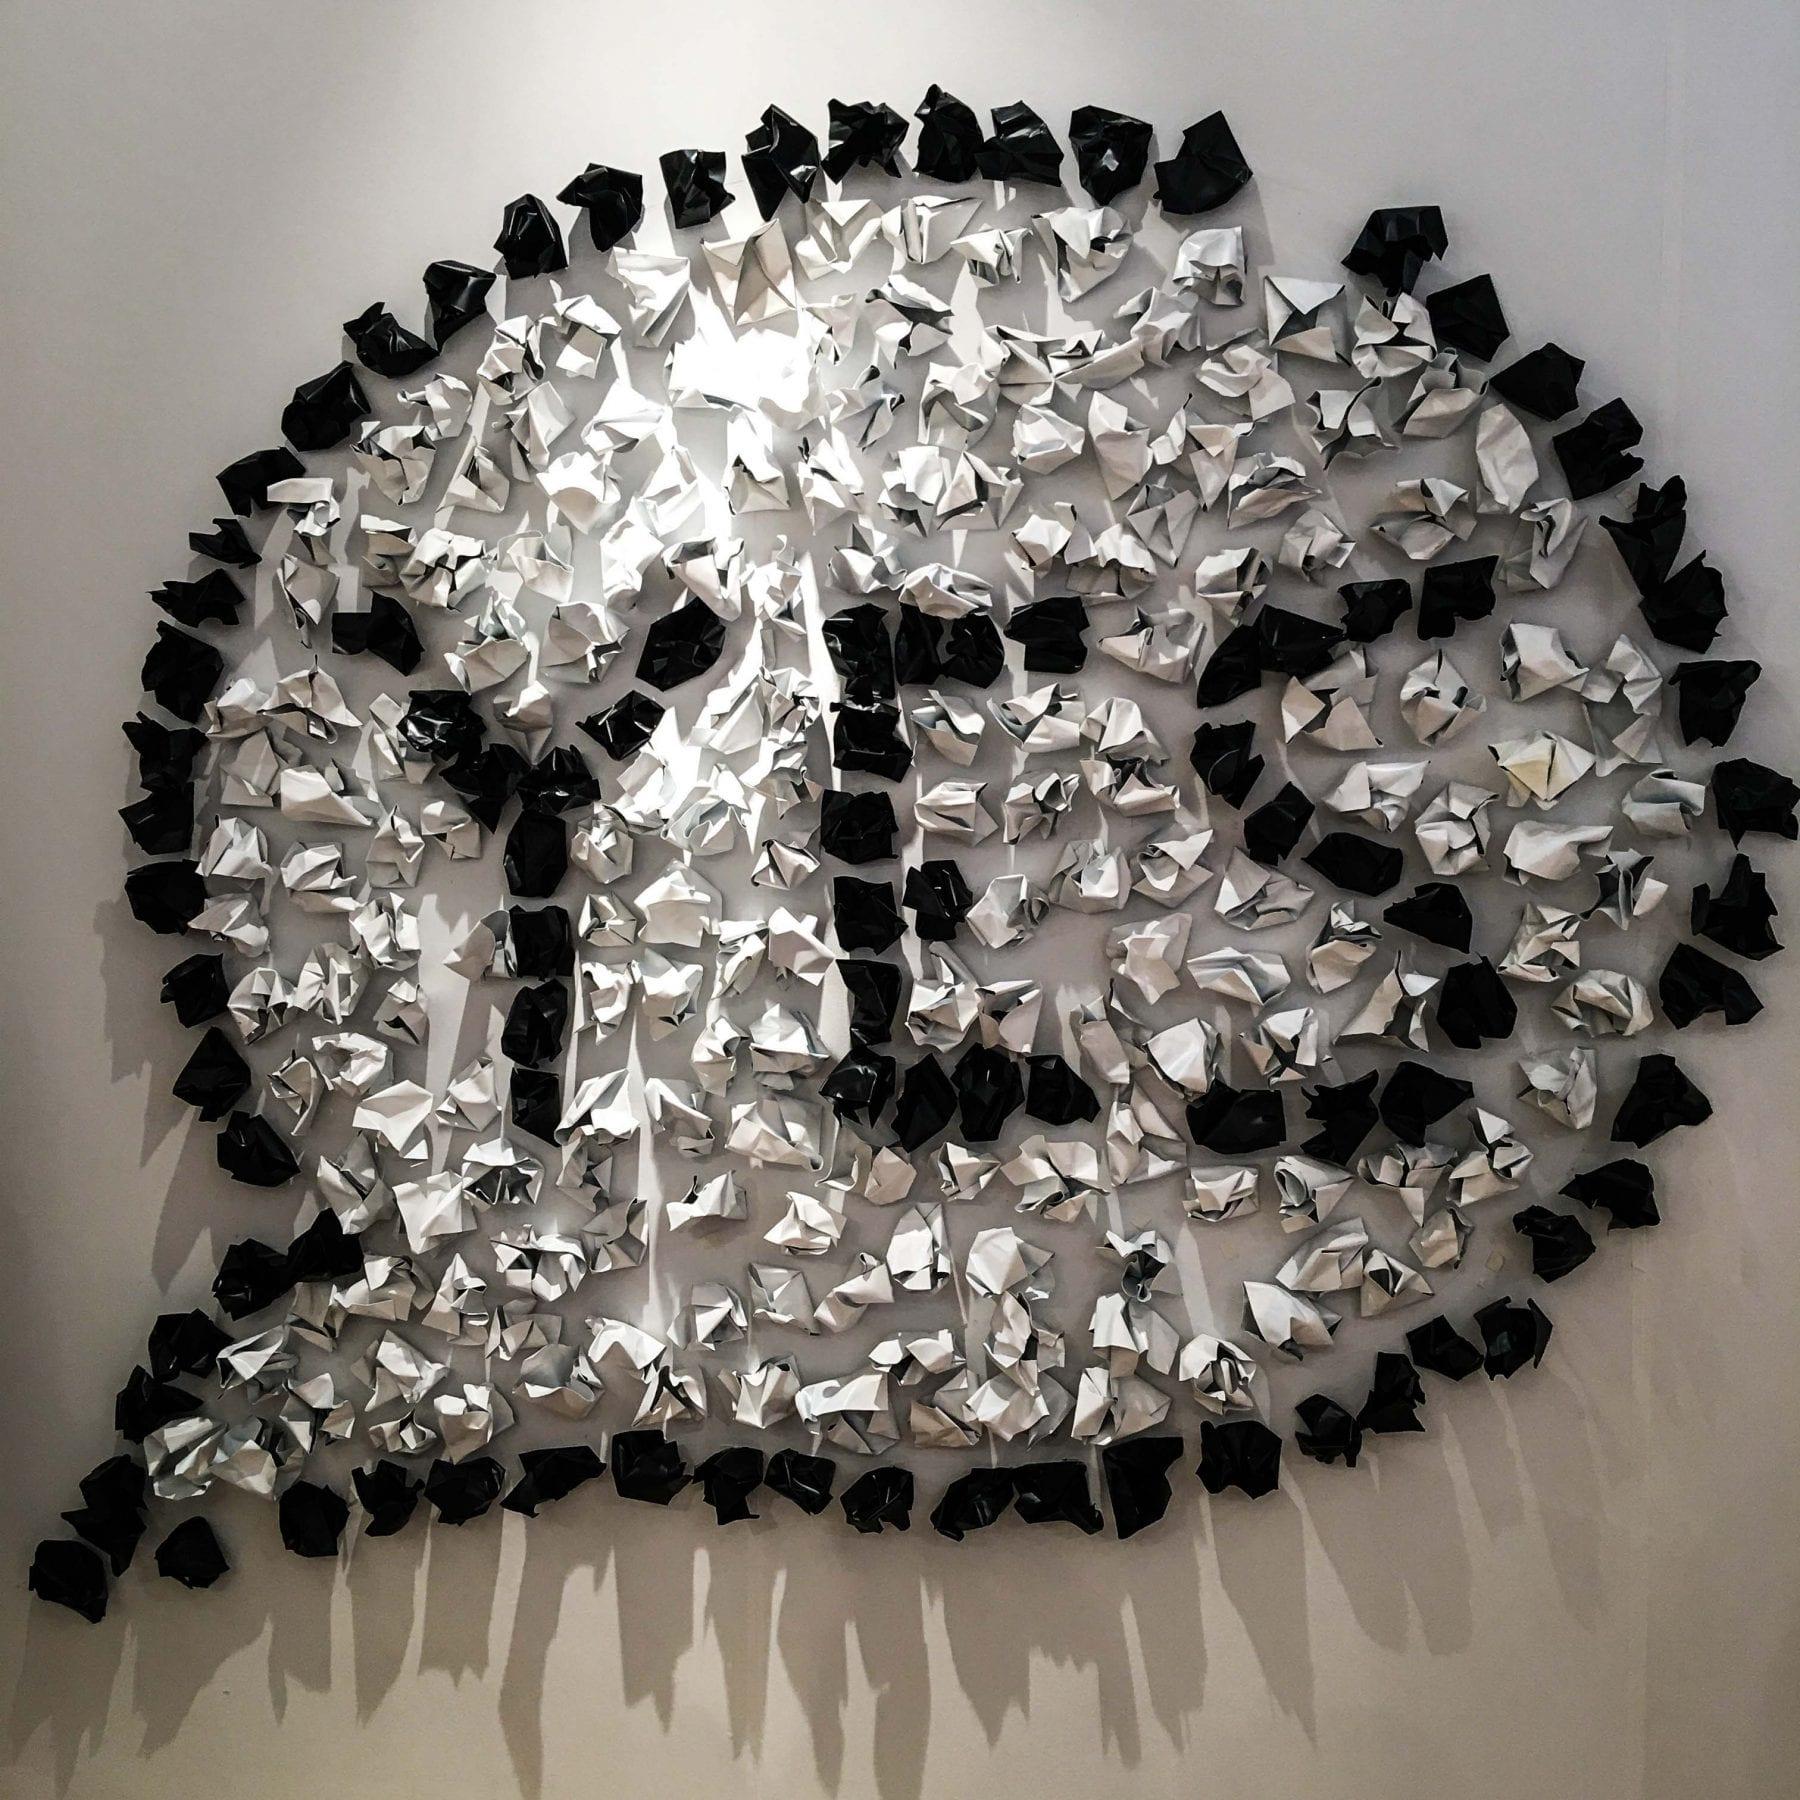 Art Basel Miami Beach, Best Artists of Art Basel Miami Beach- Your Ticket To Go Inside North America's Leading Art Fair